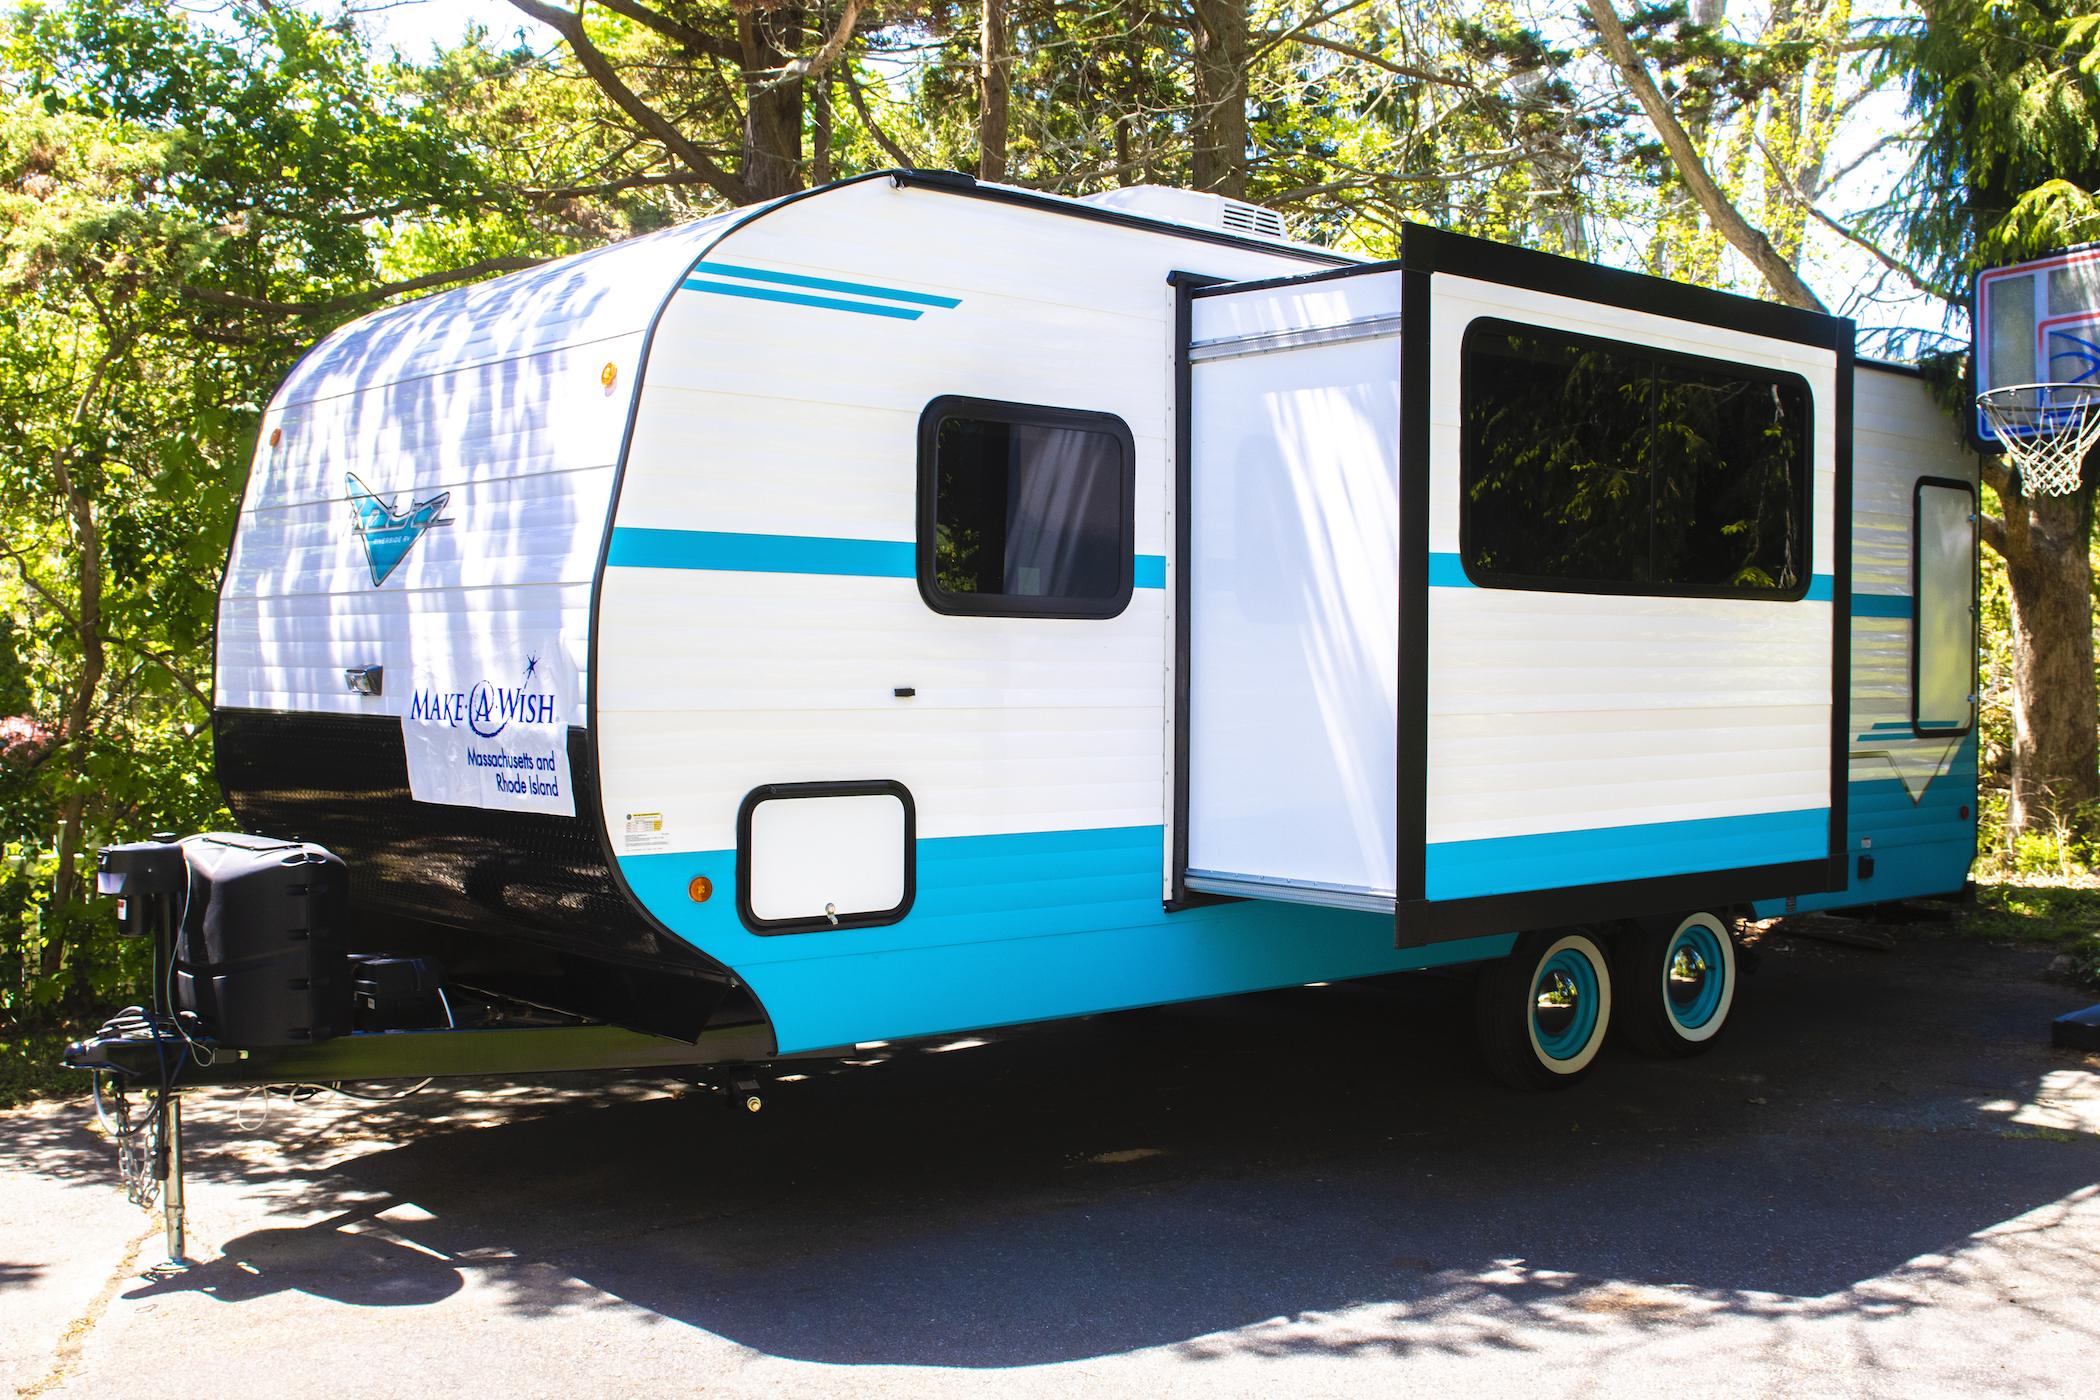 Ellie Art bunkhouse travel trailer